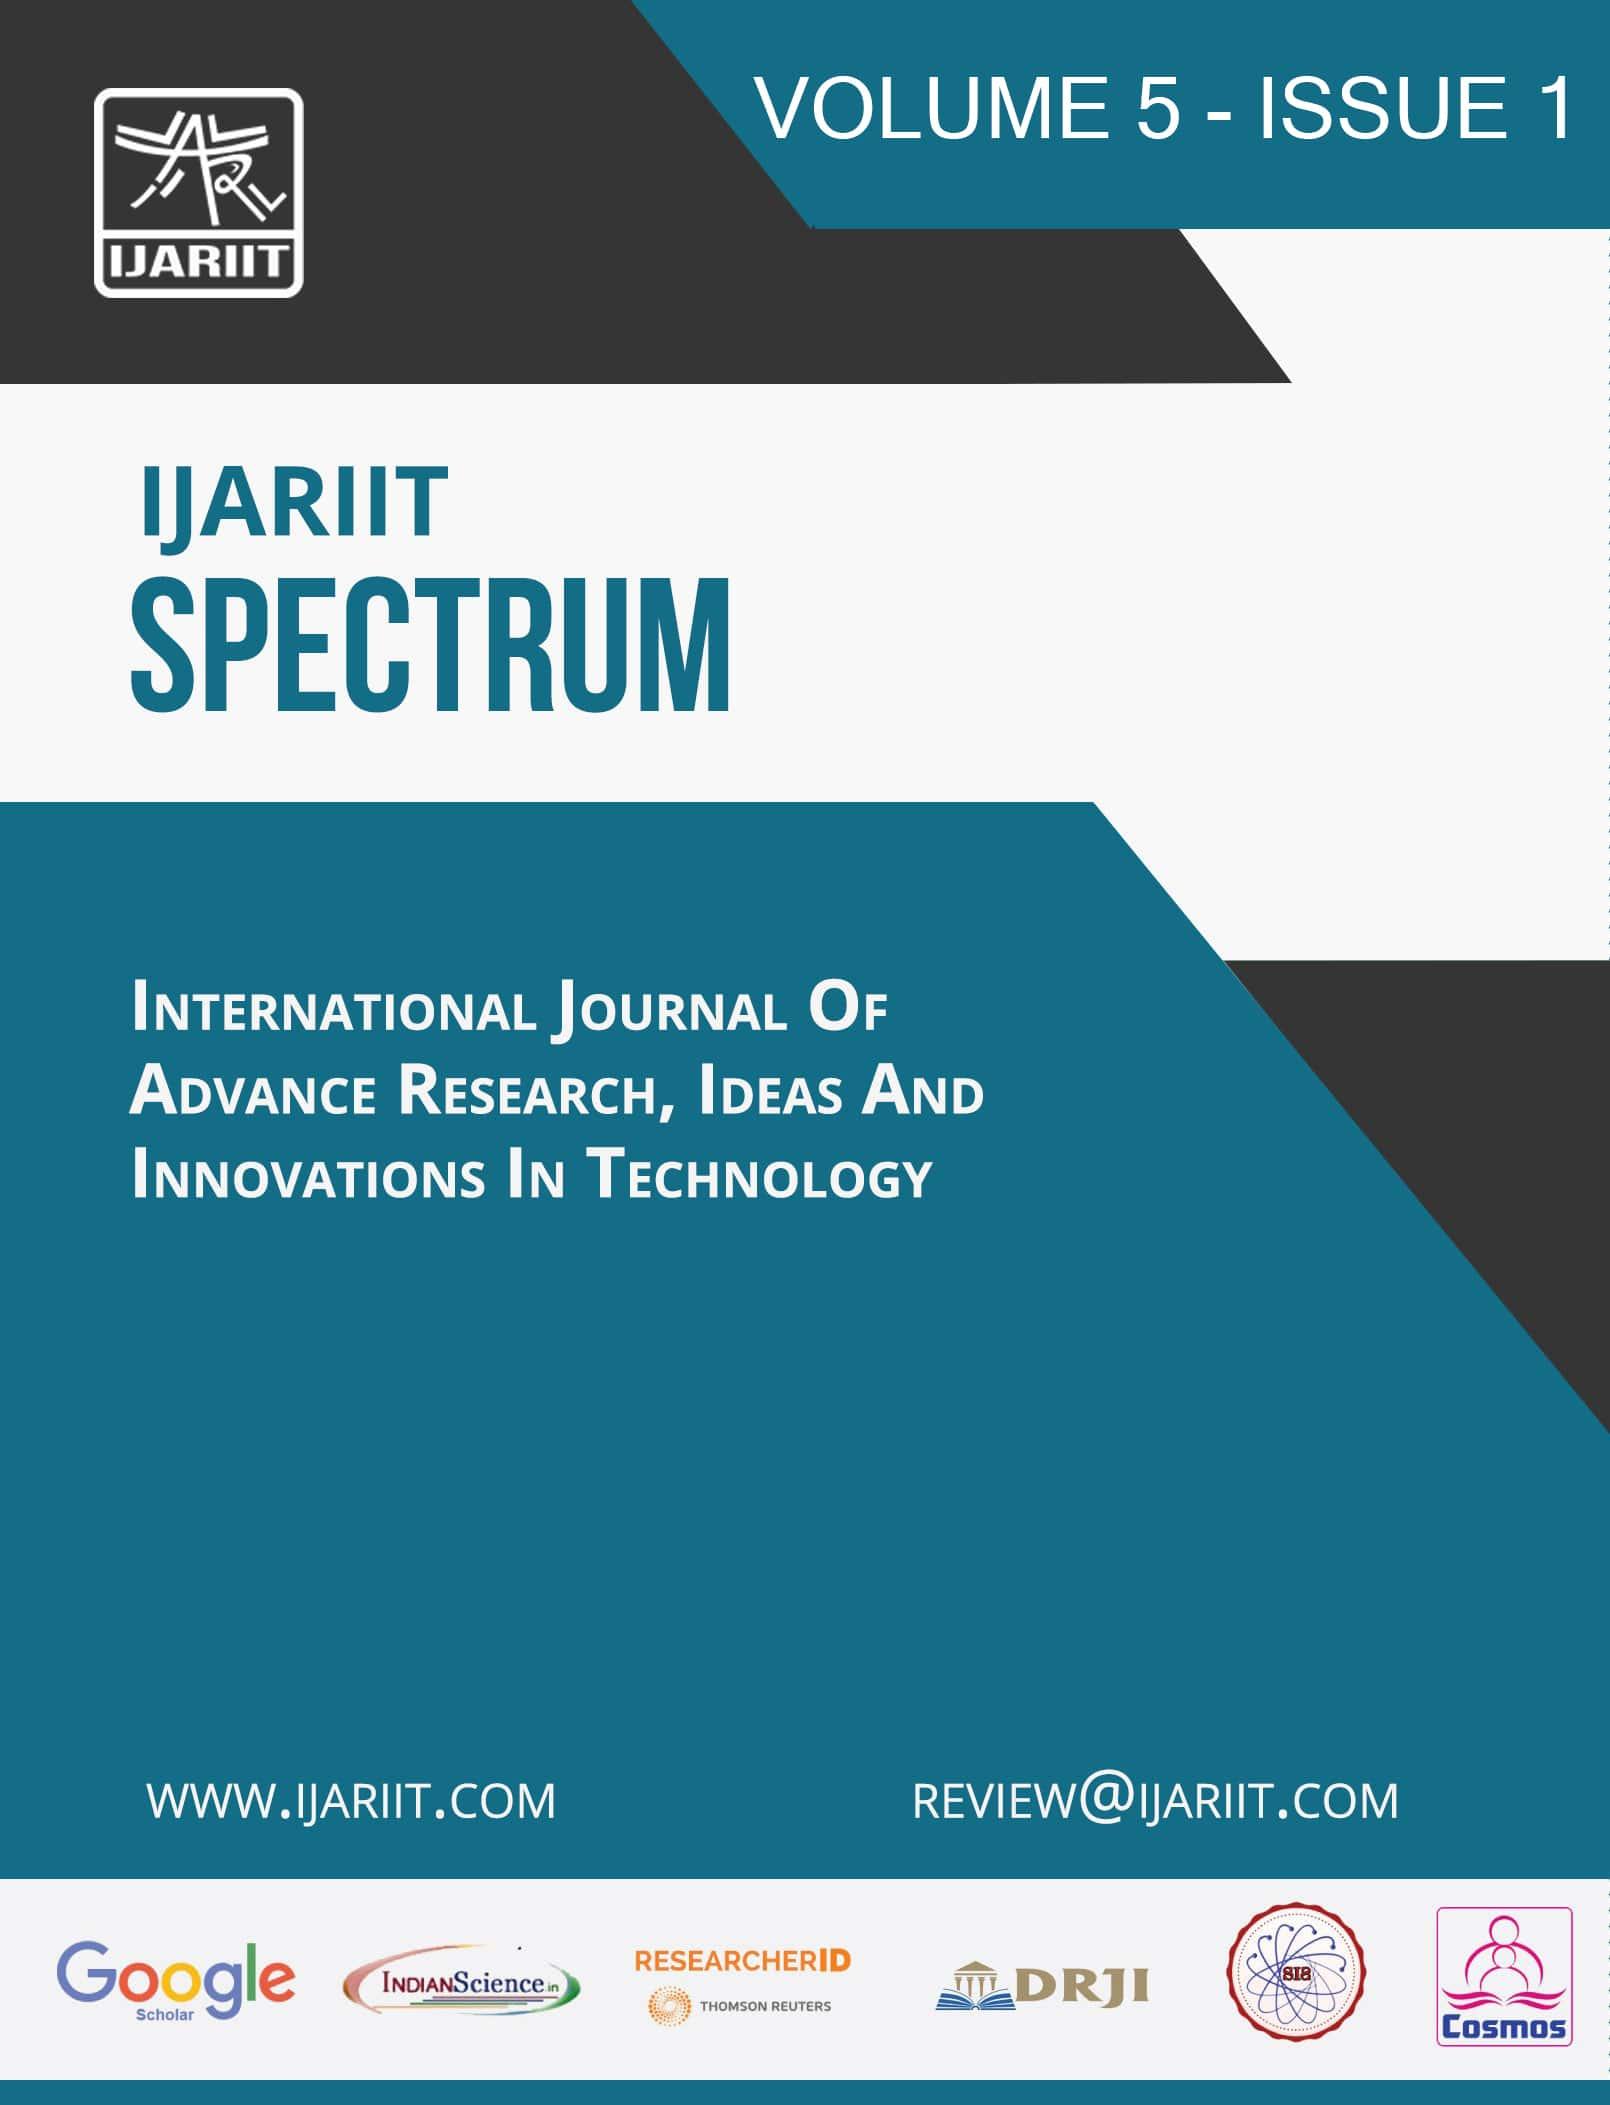 Edition: Volume-5, Issue-1 - IJARIIT